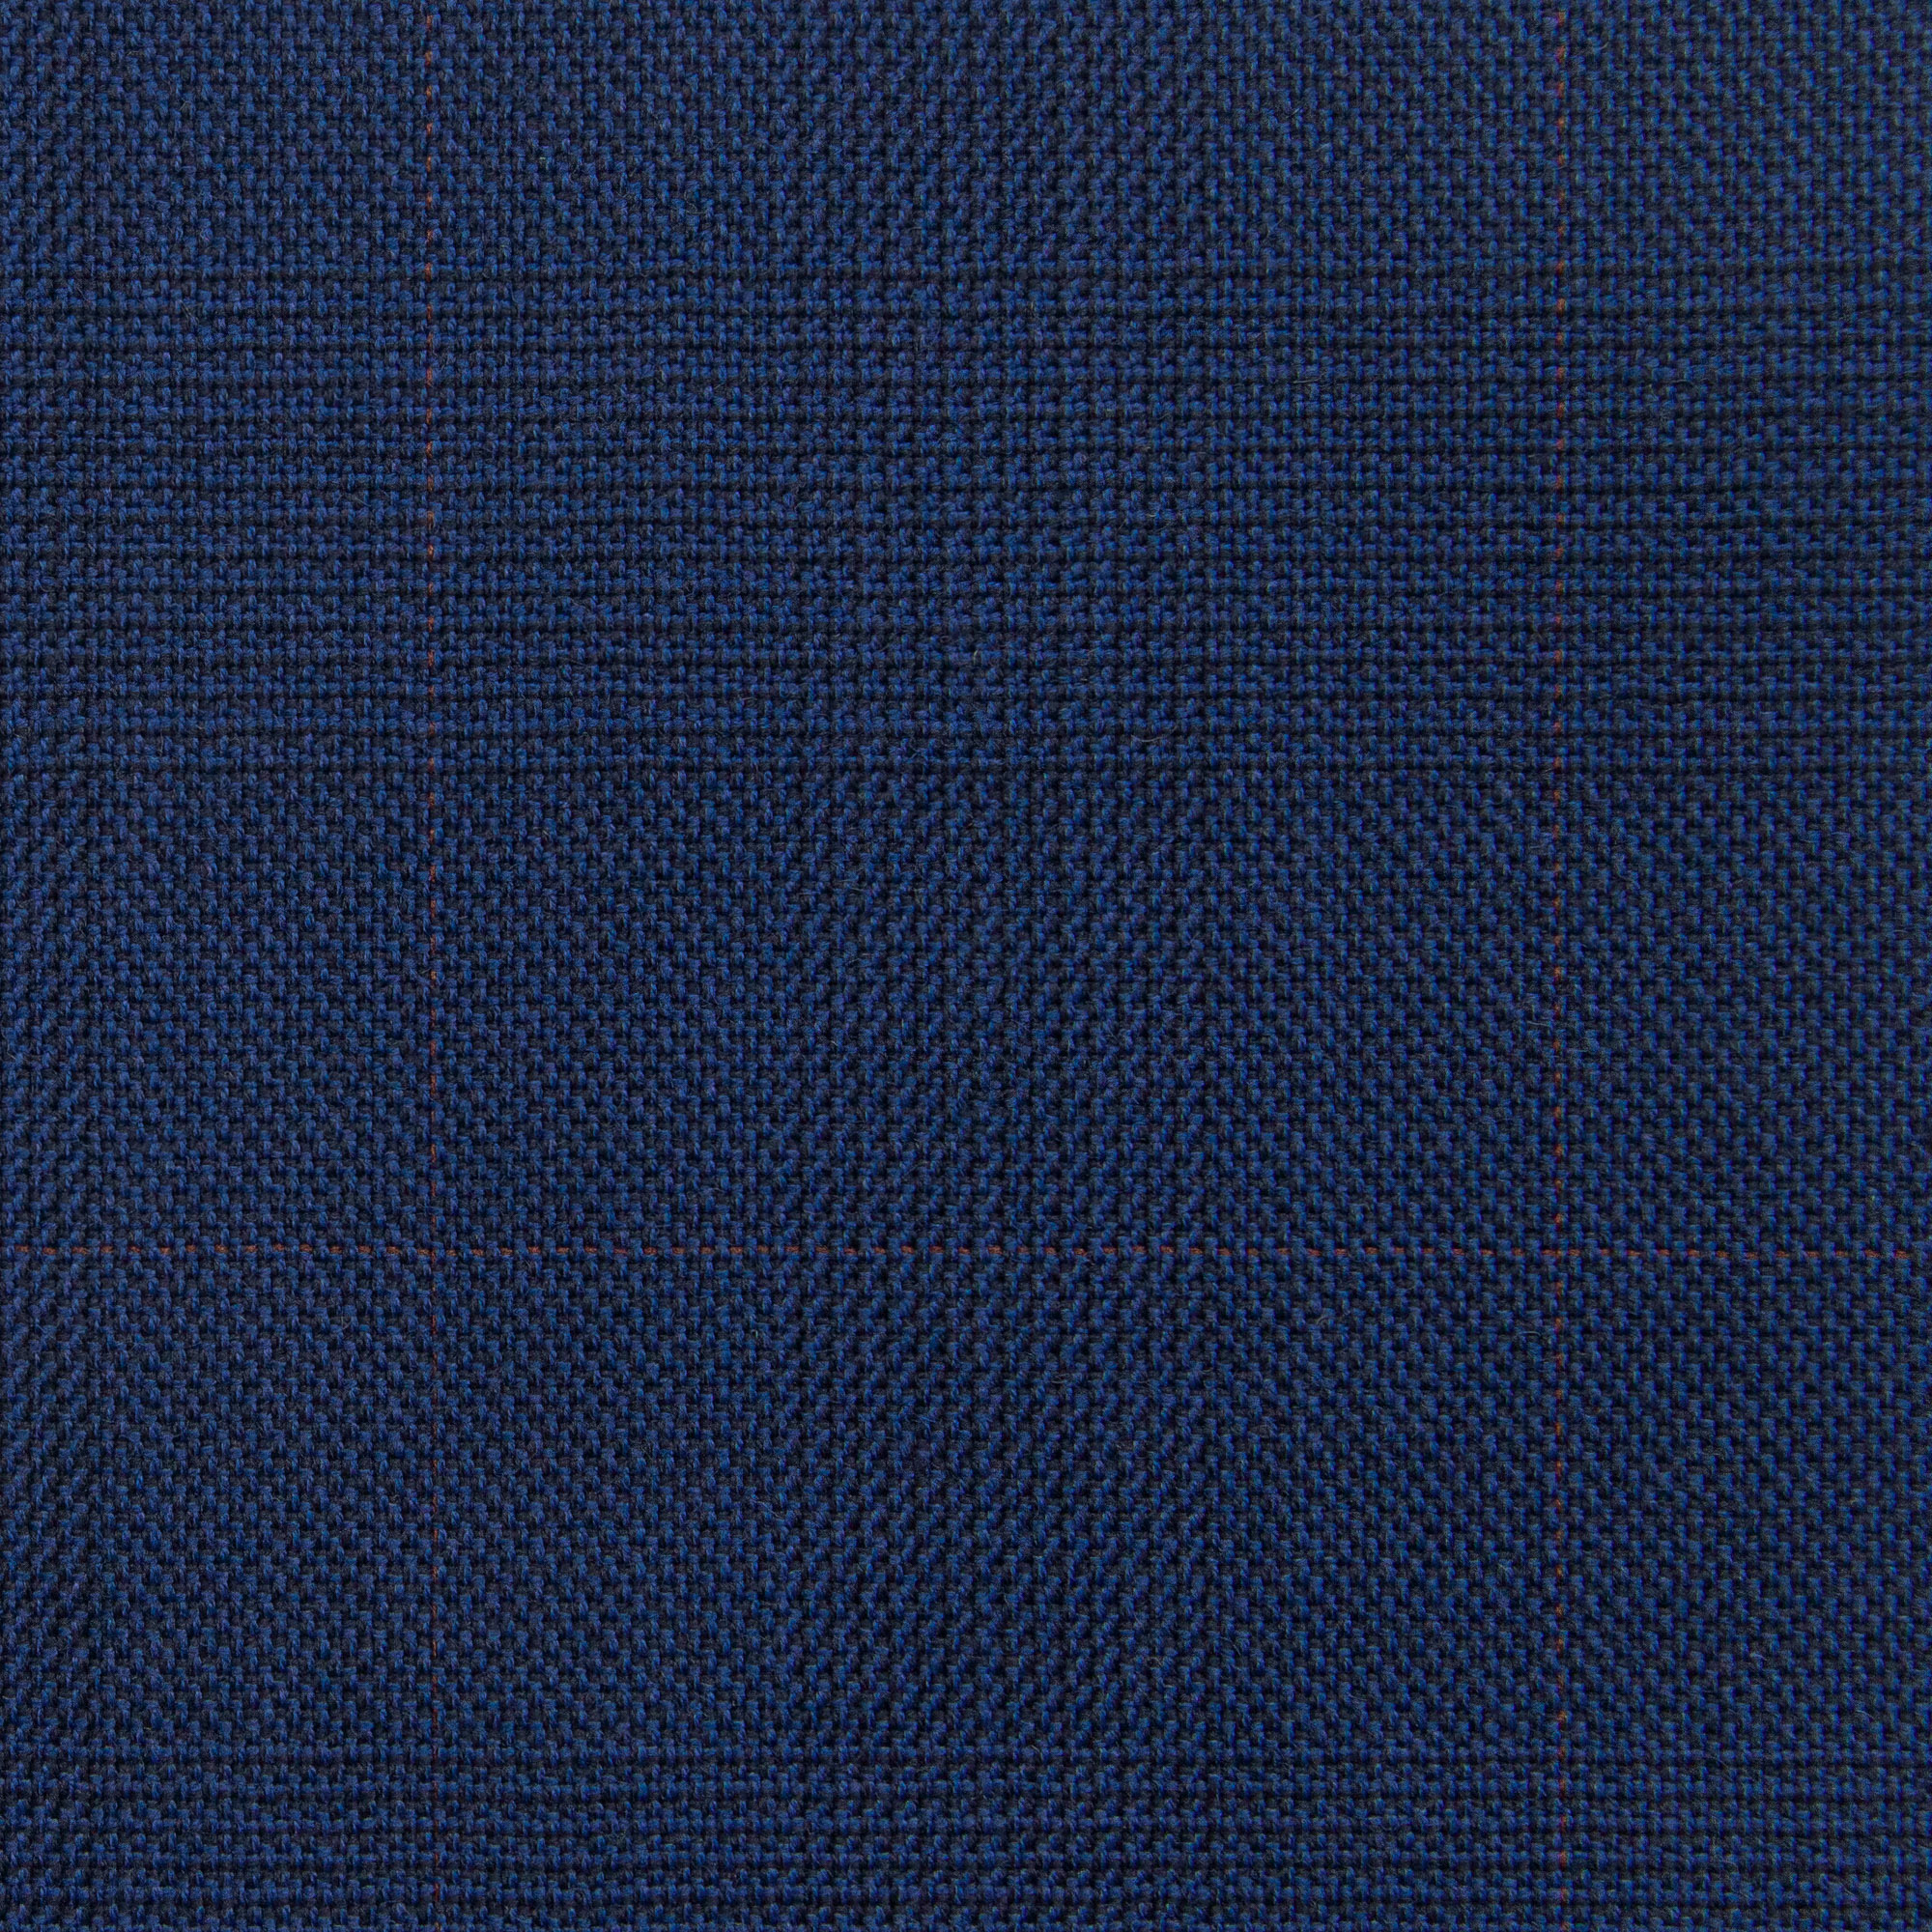 Sz062201 1